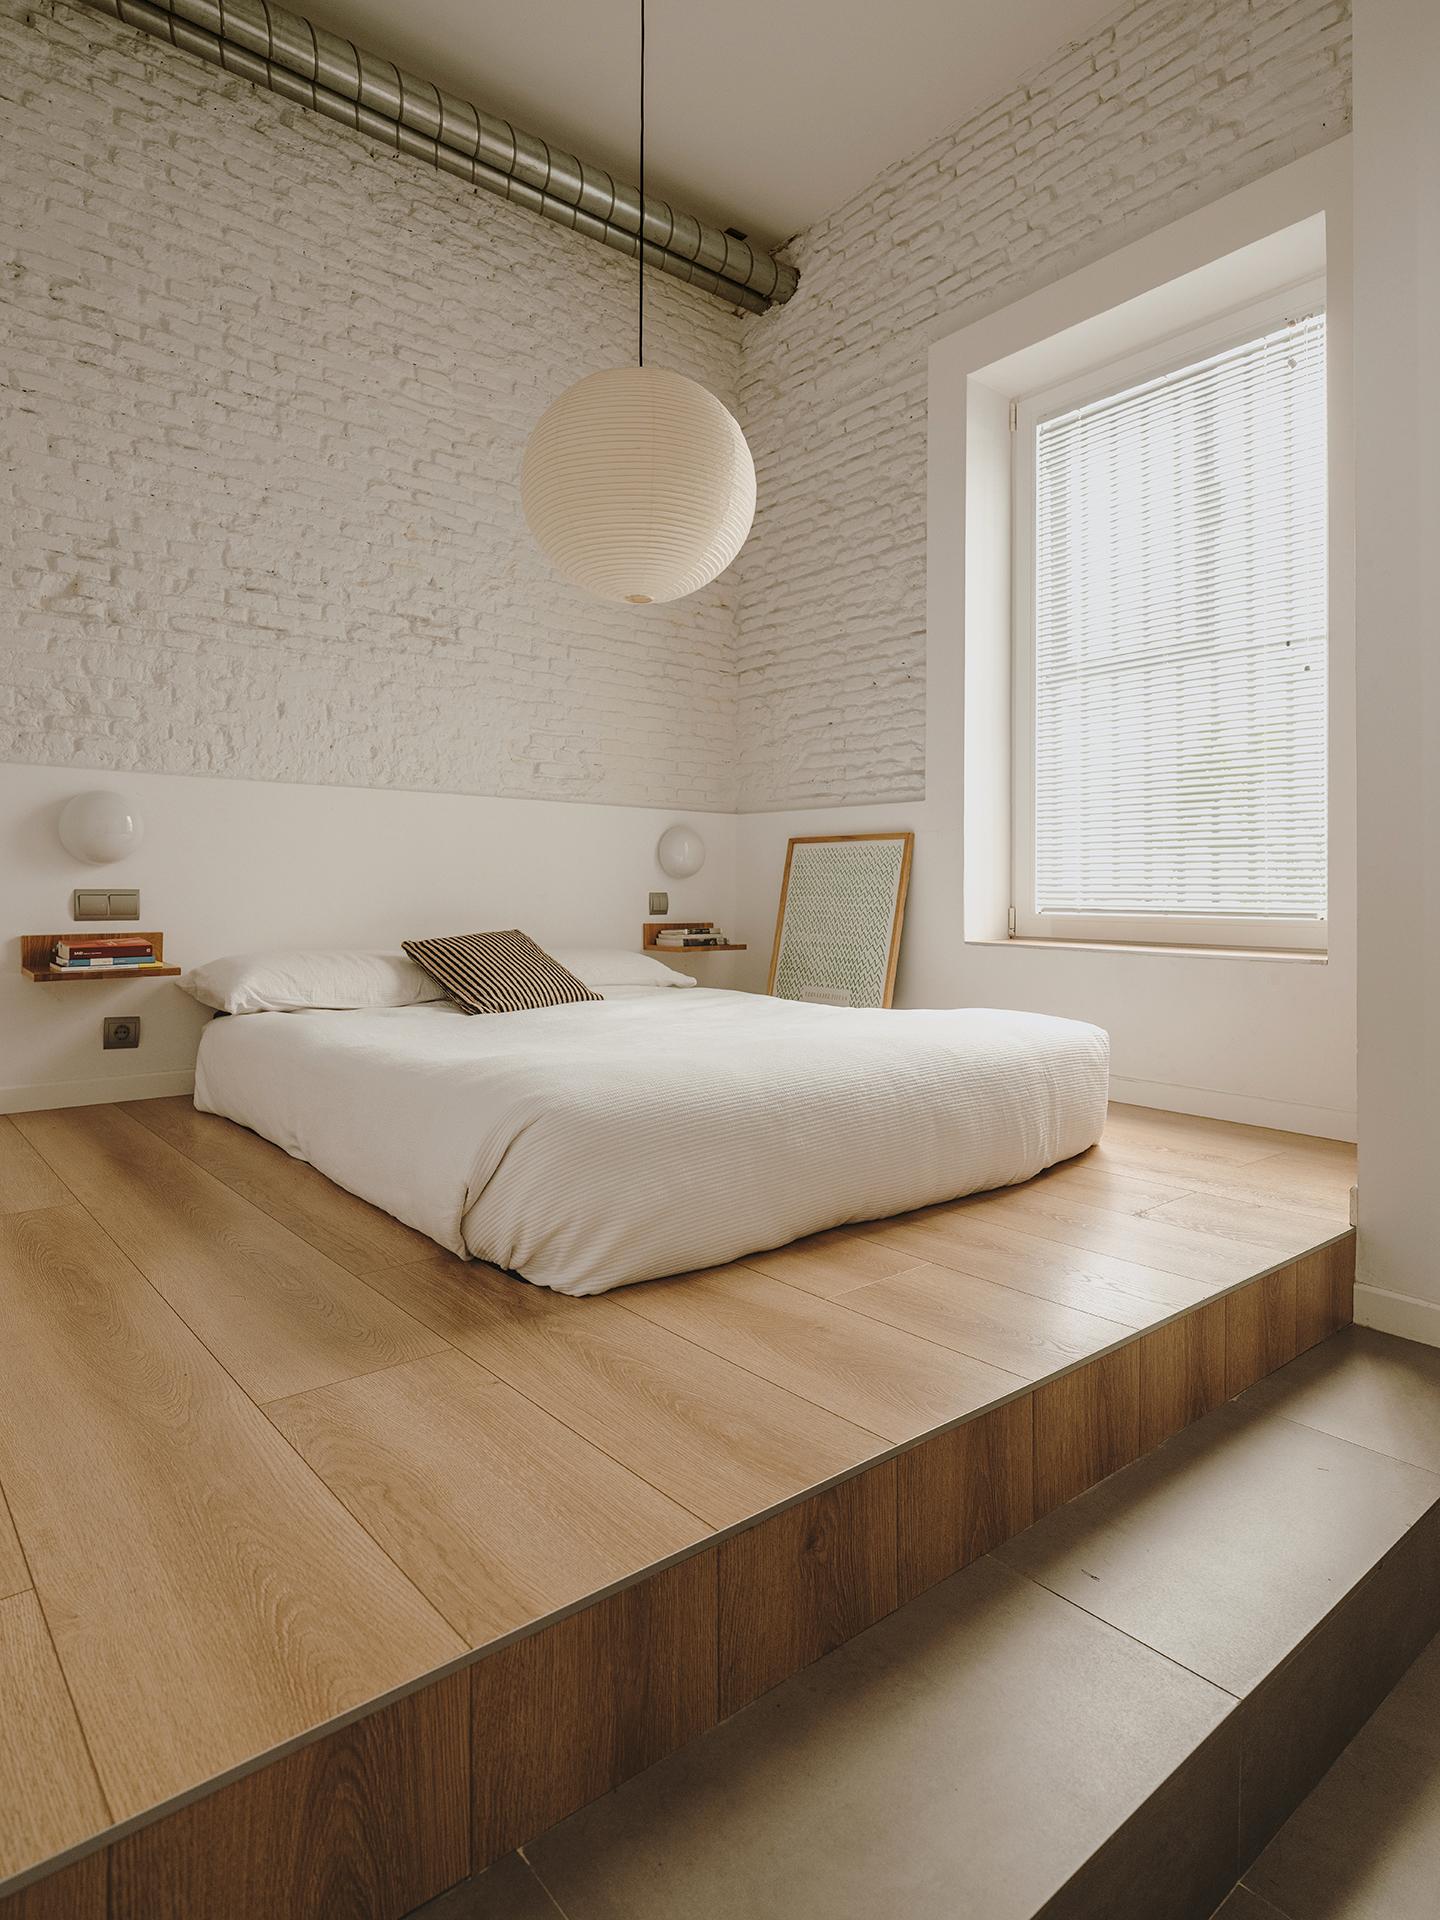 Casa MOB 2019 - Madrid, Spain